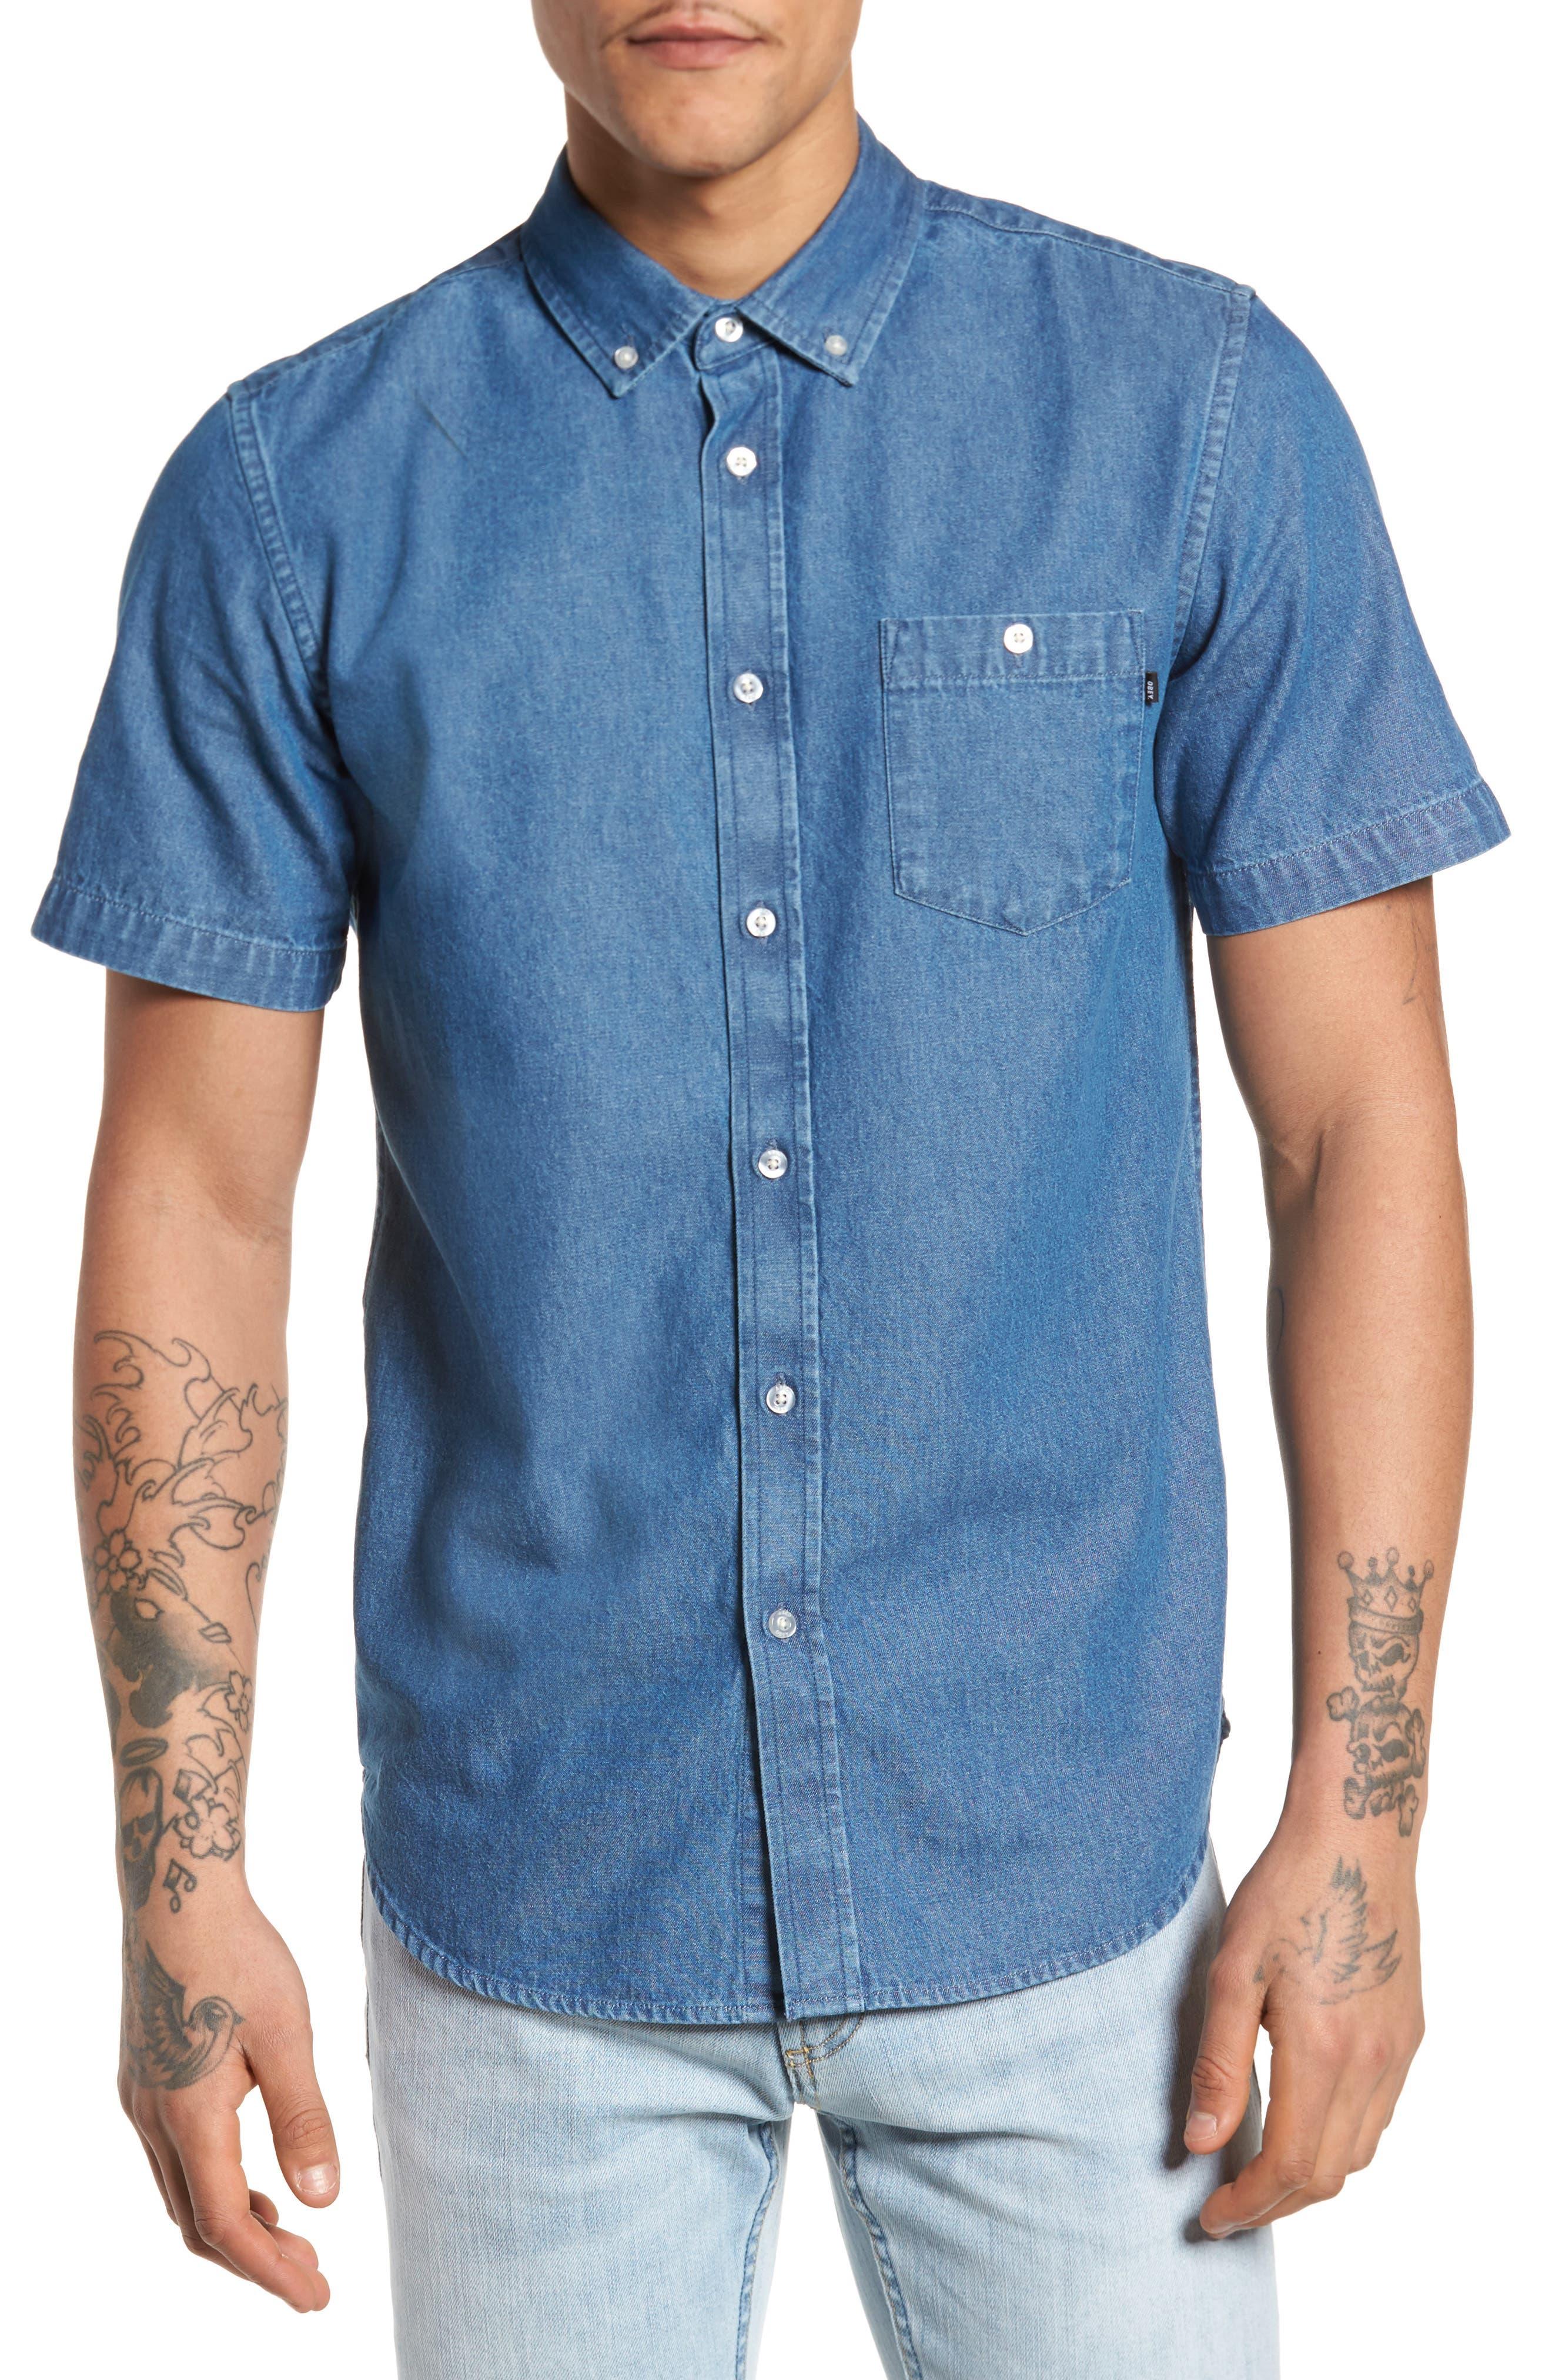 Kebble Denim Shirt,                             Main thumbnail 1, color,                             450